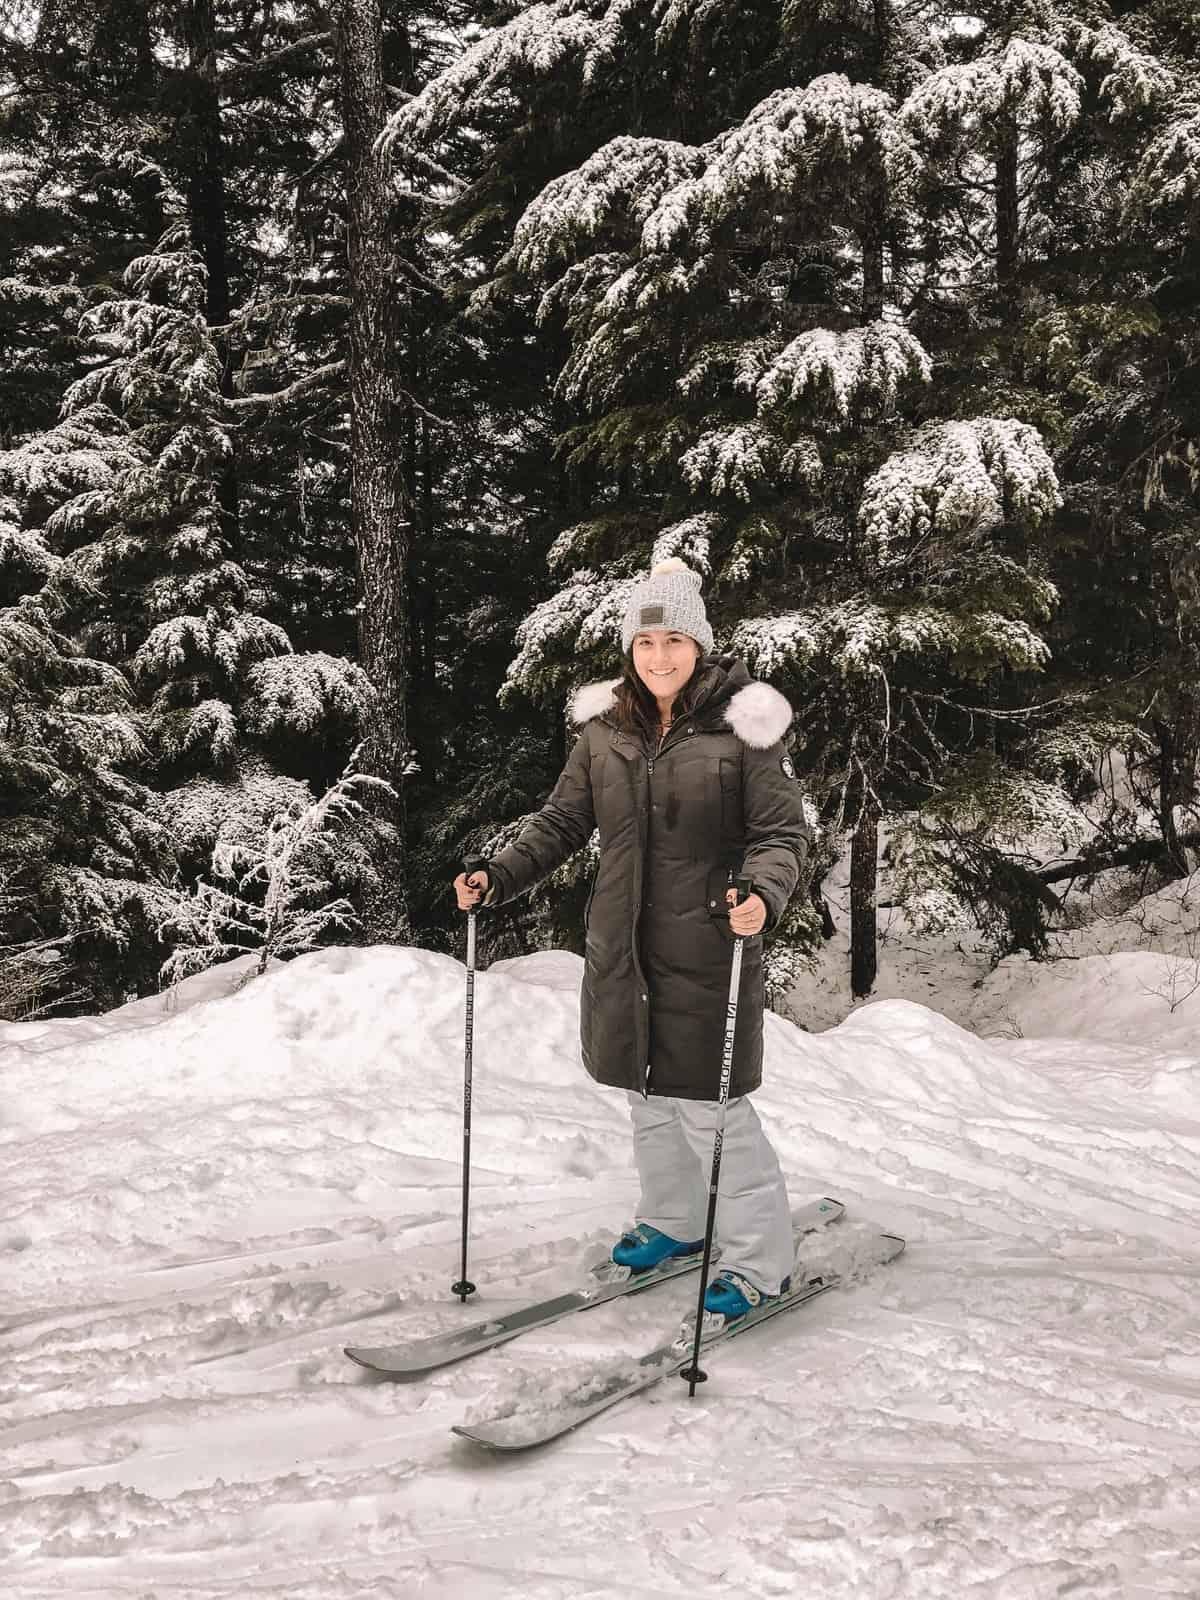 Skiing at Alyeska Ski Resort in Anchorage, Alaska